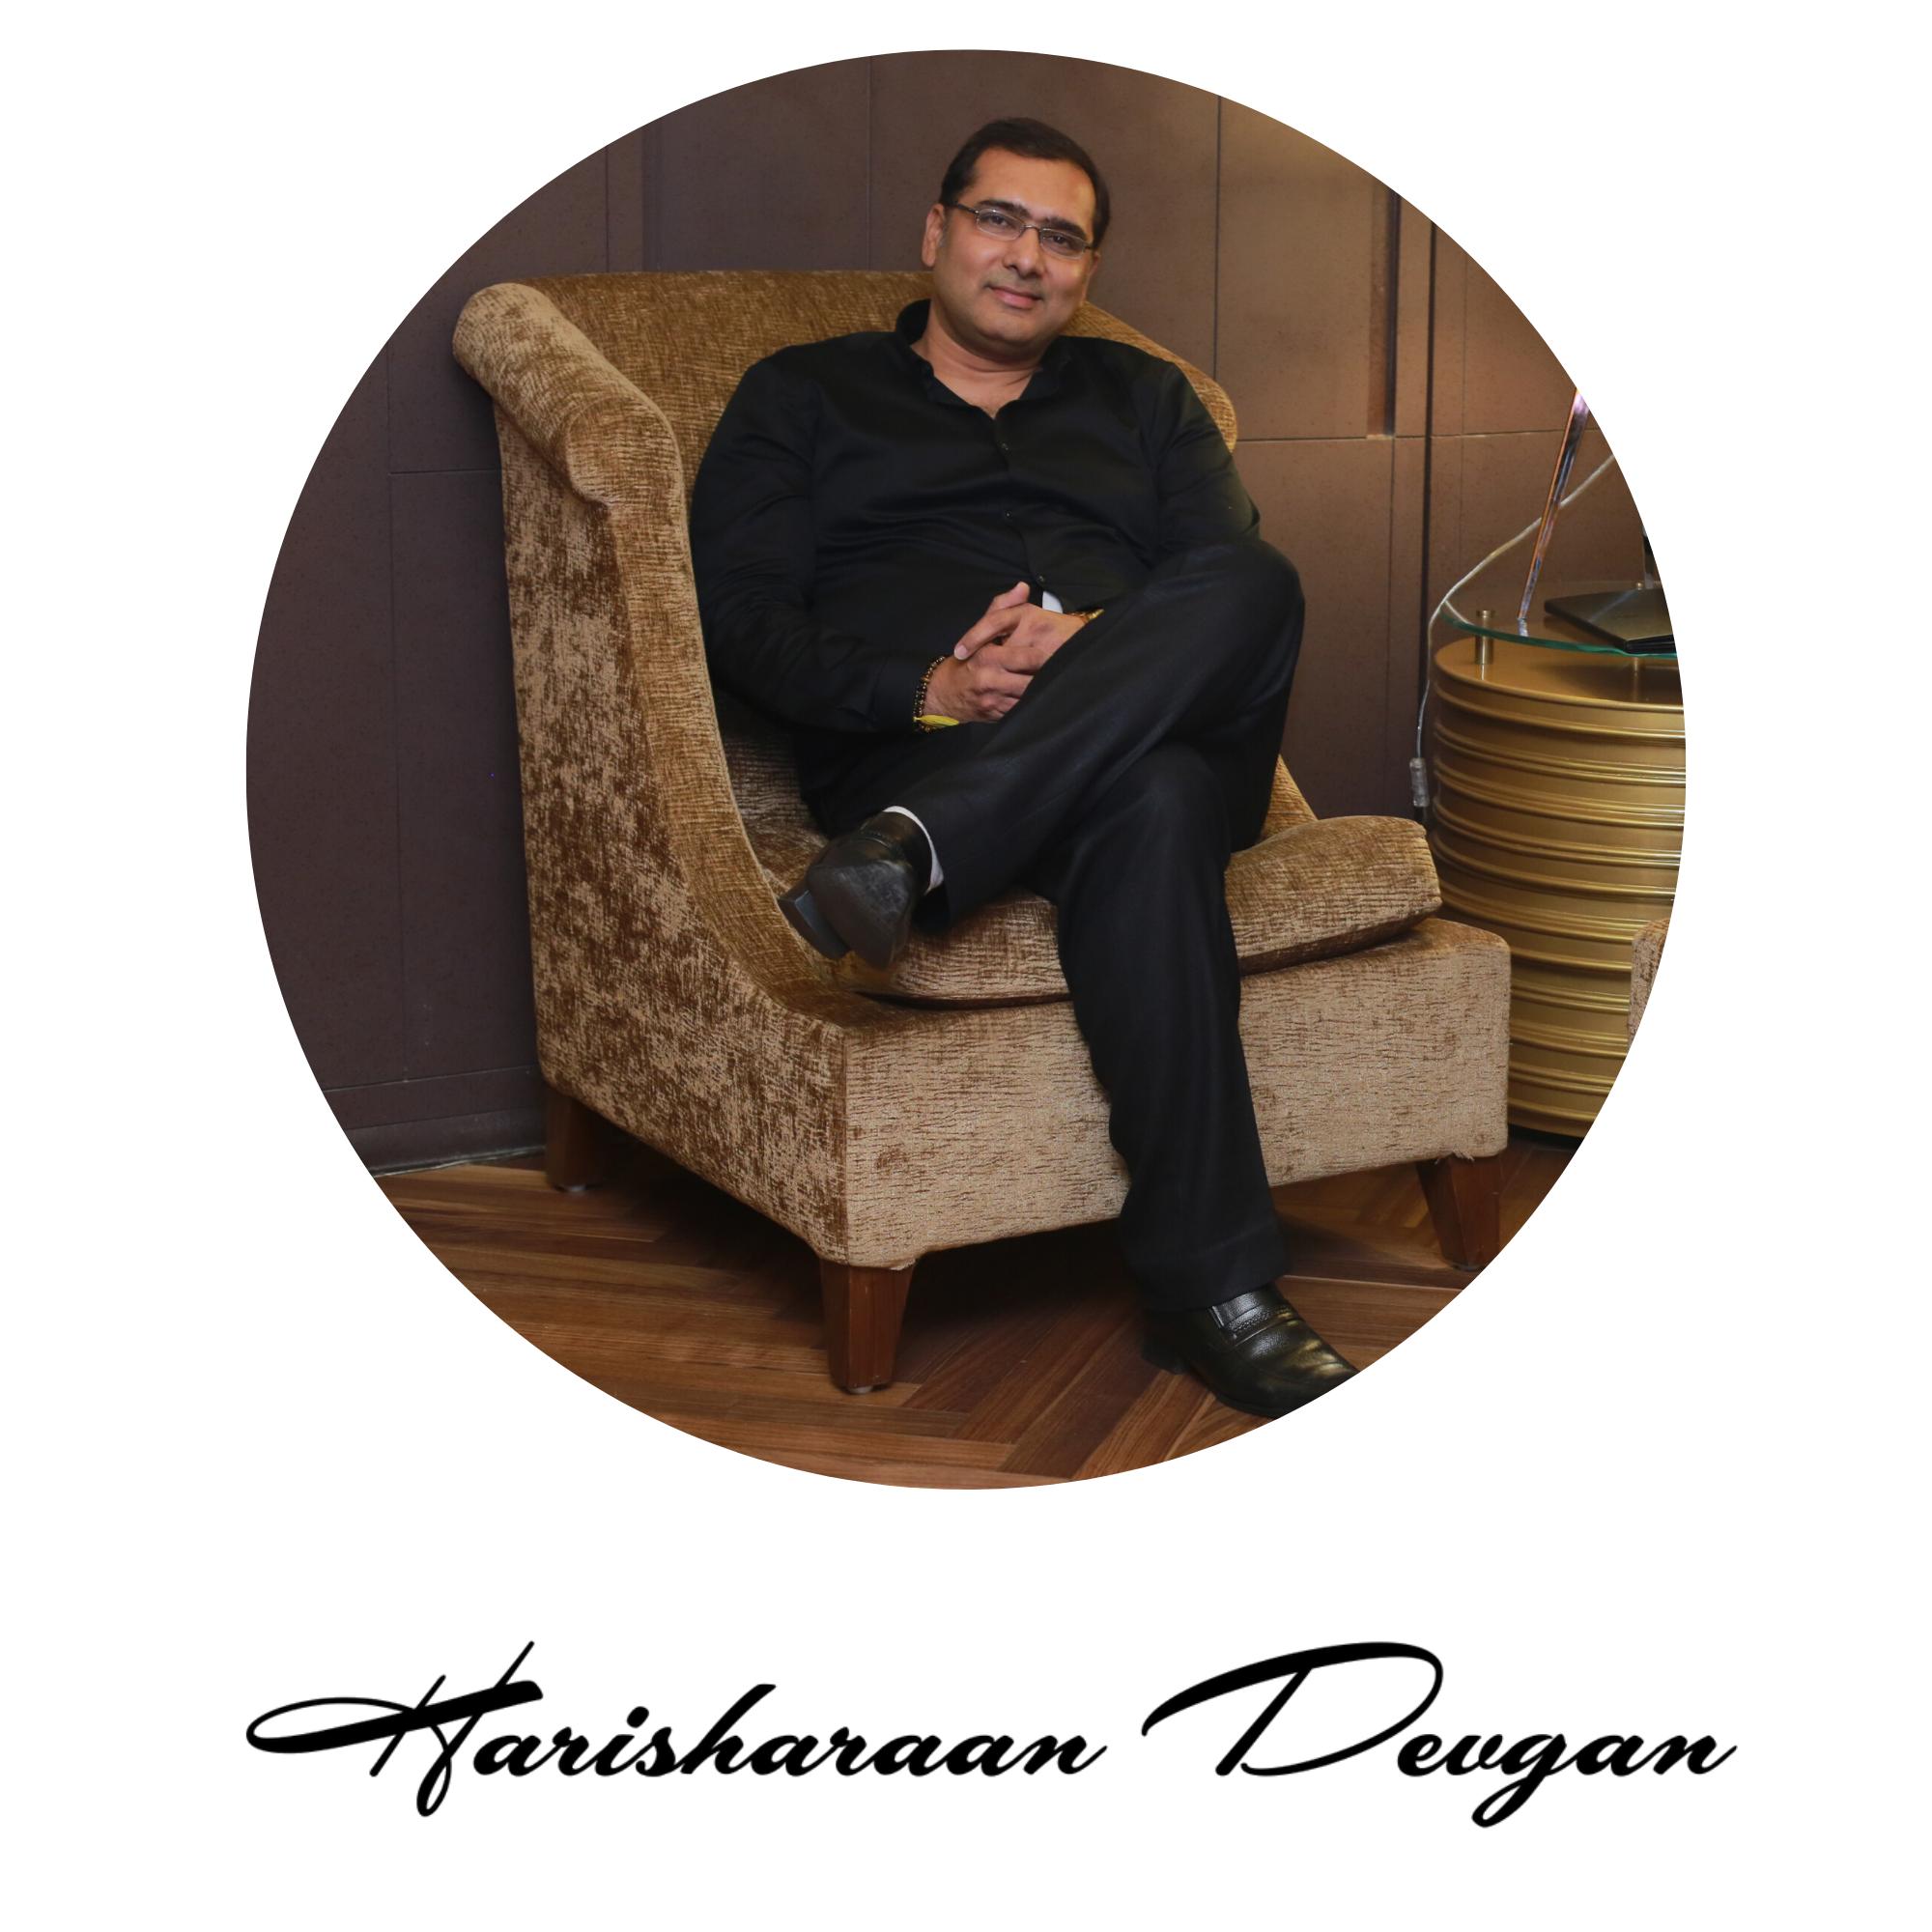 Harisharan Devgan